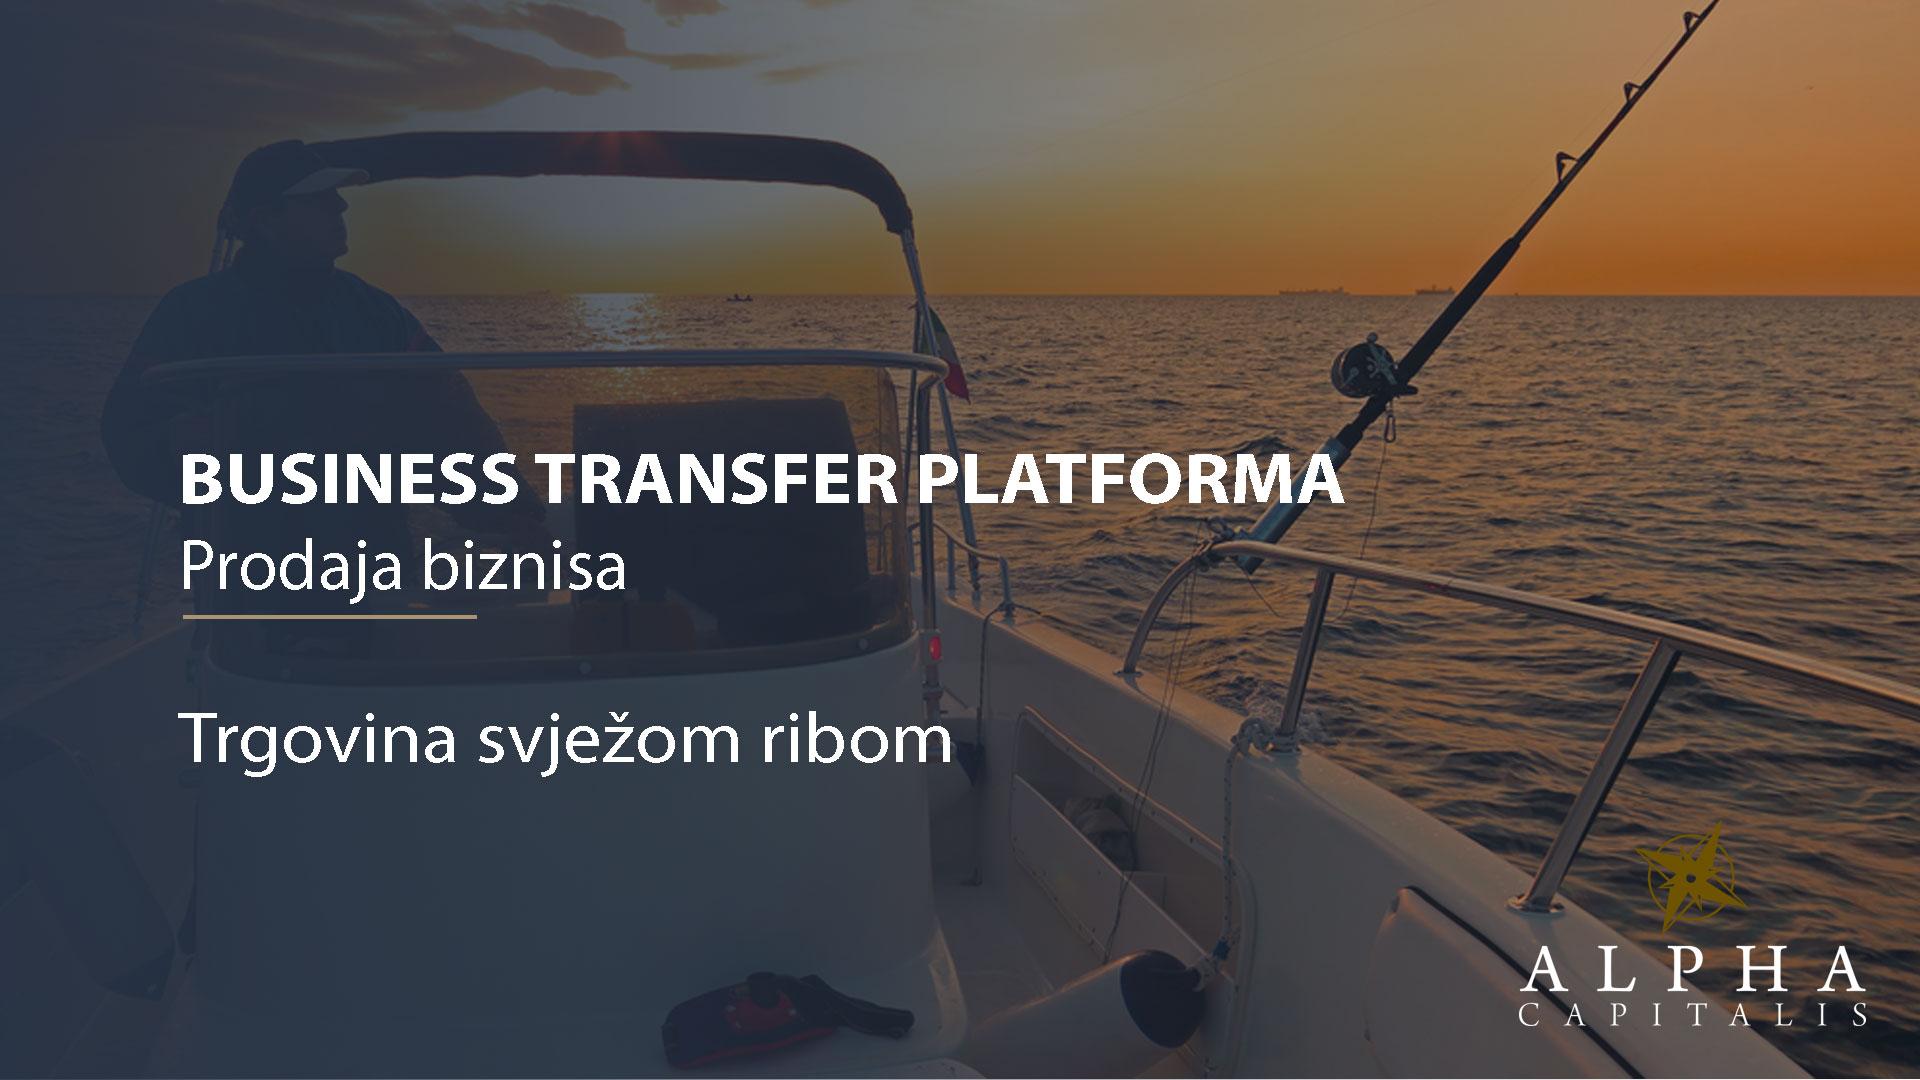 Business-transfer-platforma-prodaja biznisa-trgovina-svježom ribom